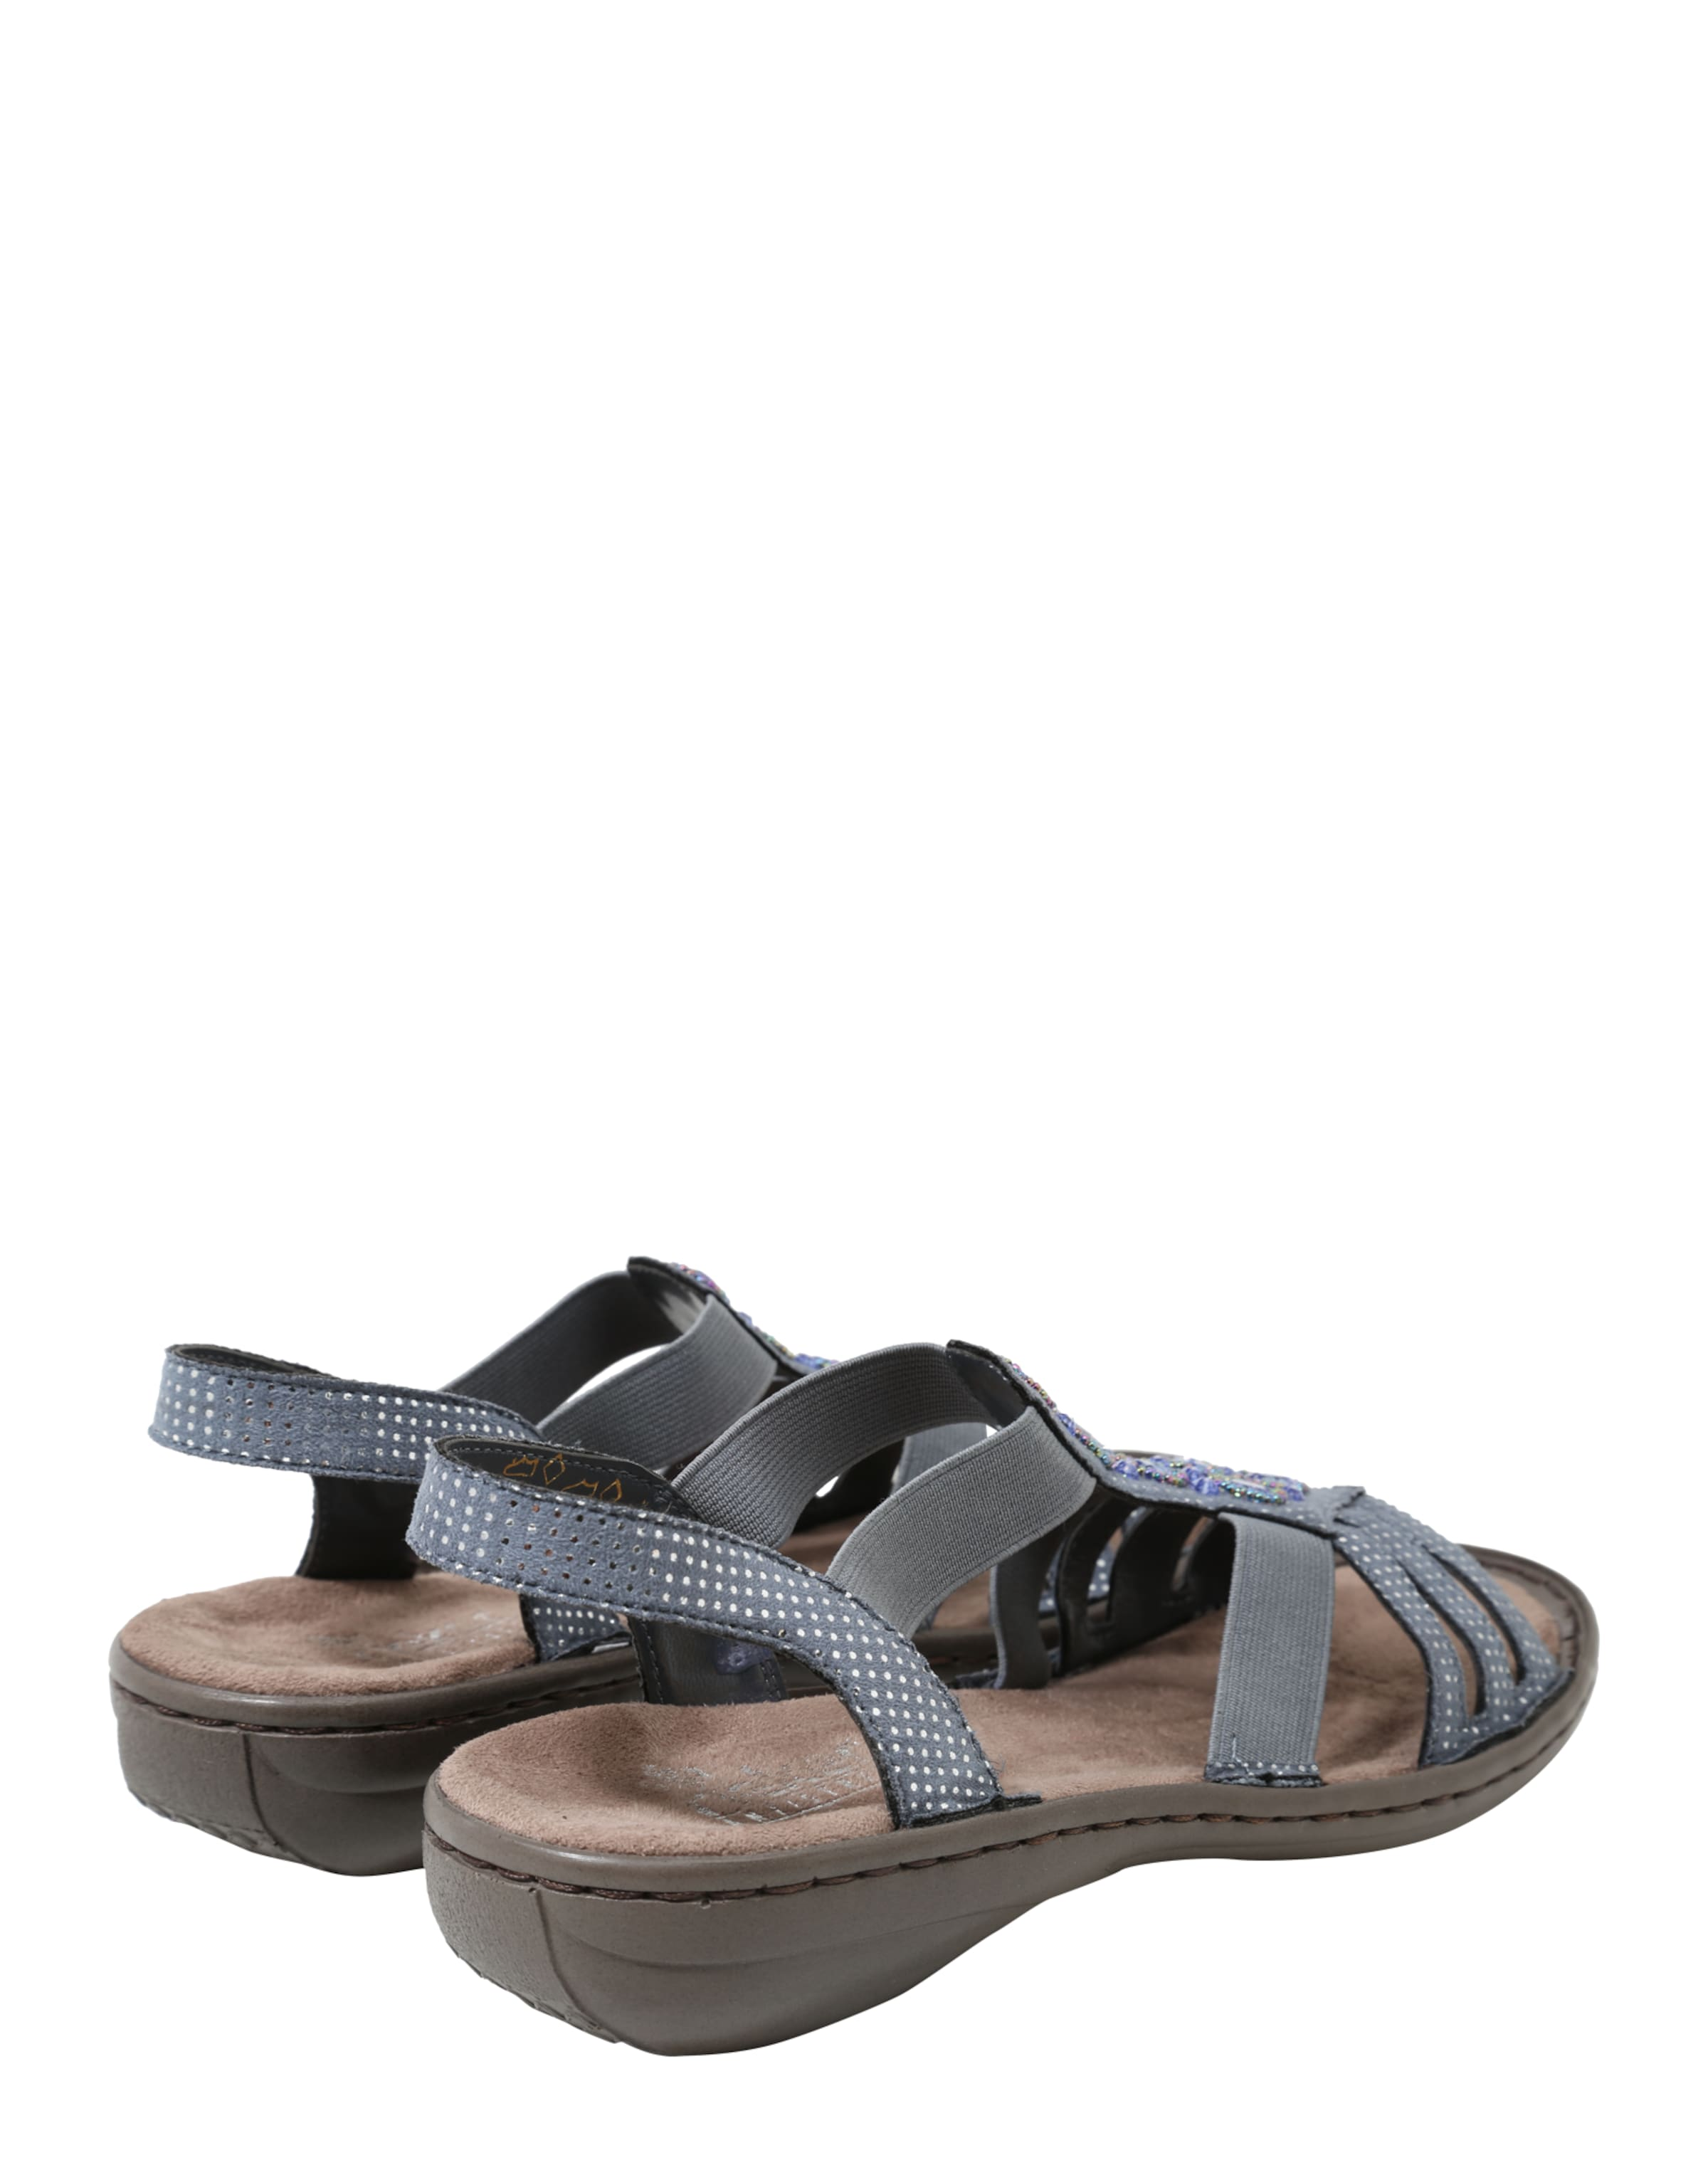 RIEKER Sandale Sandale Sandale sonstiges Material Bequem, gut aussehend 4fd9c3